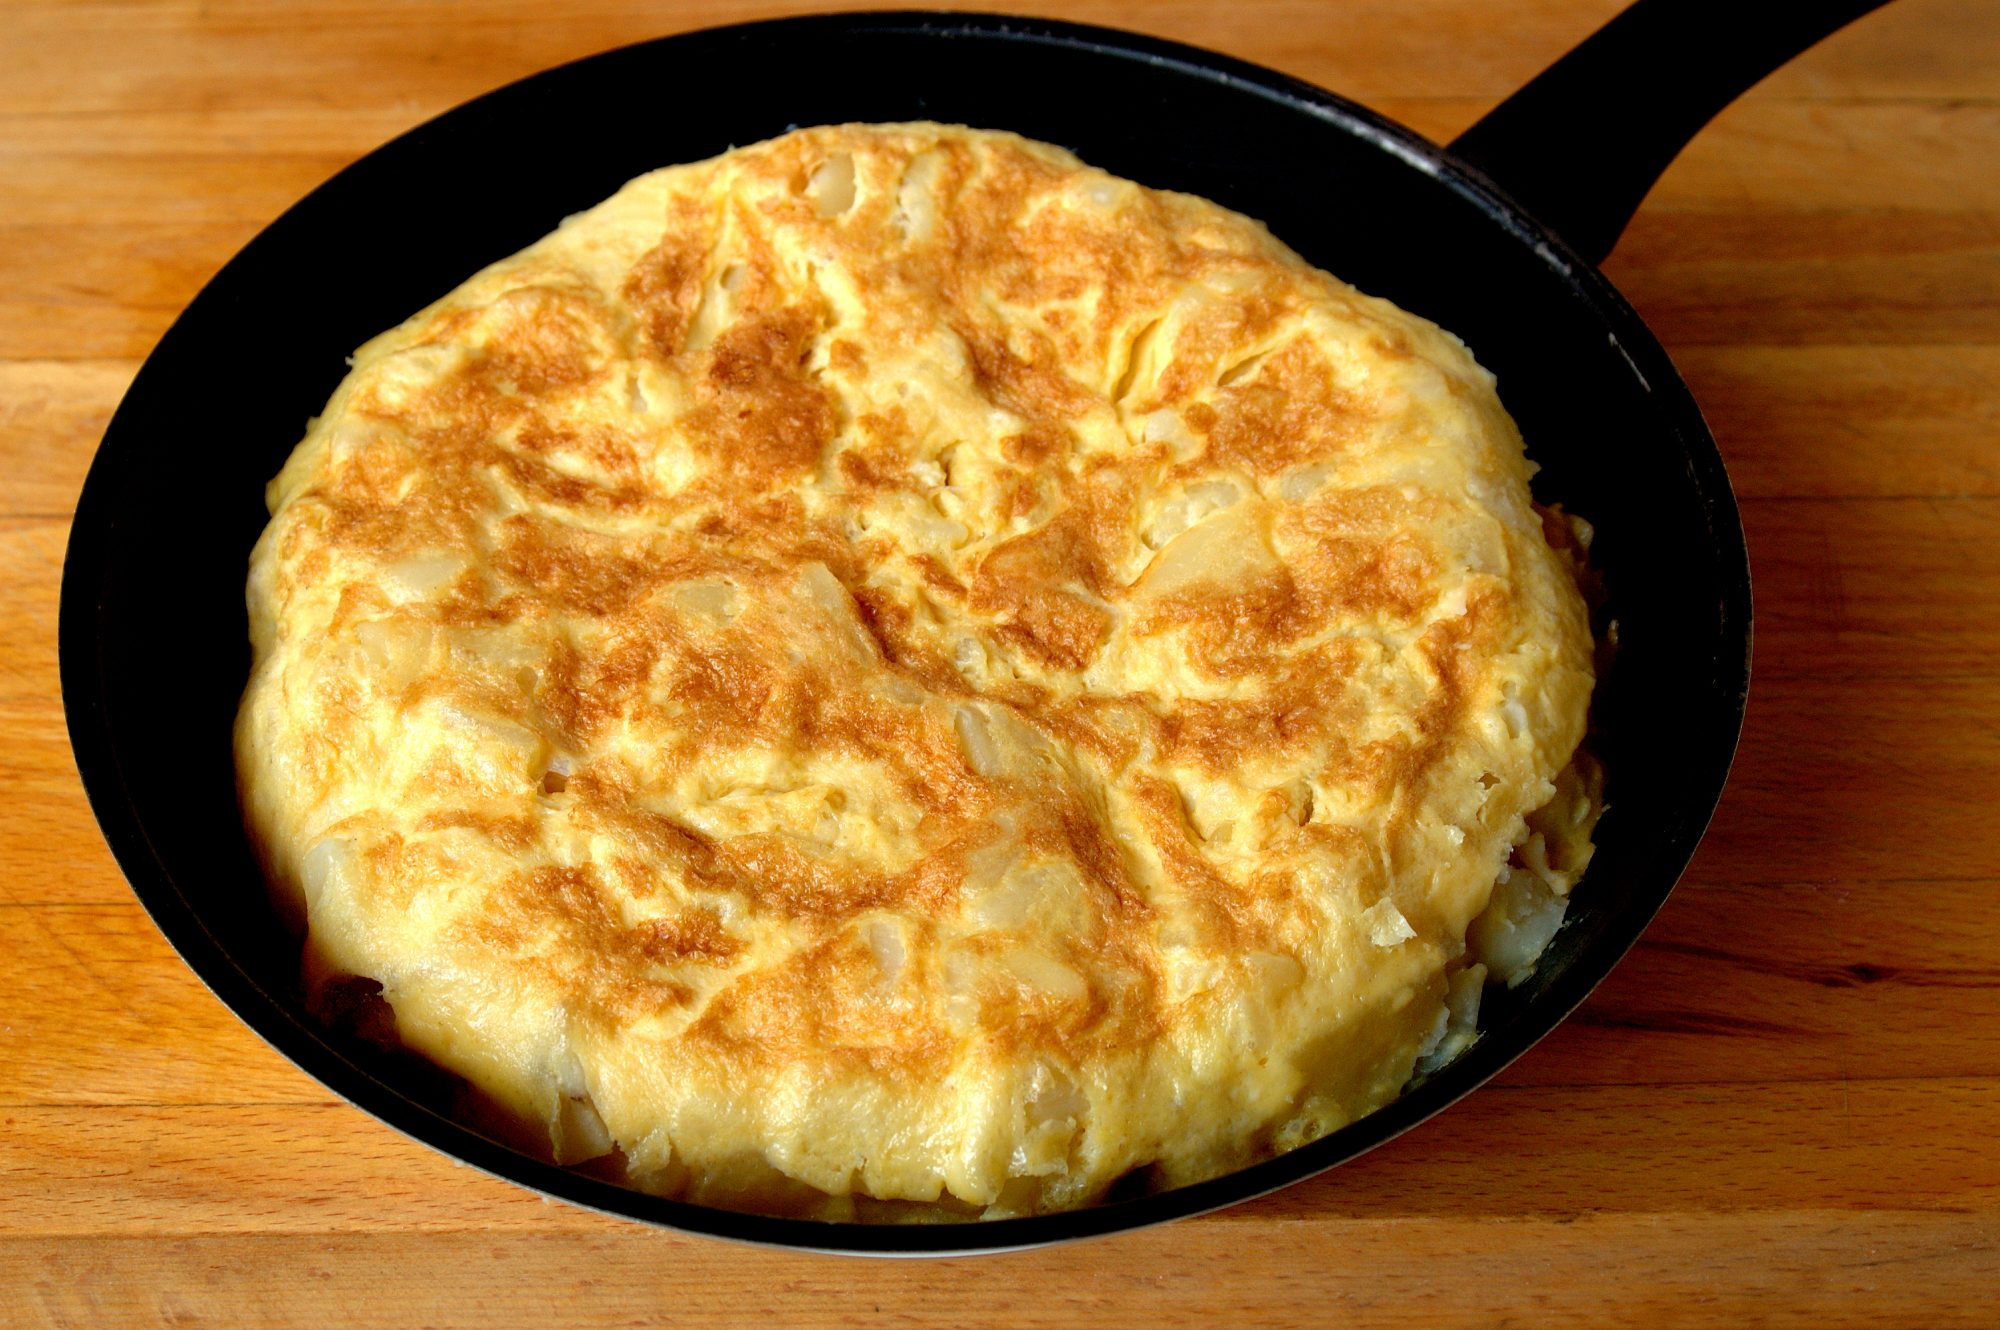 getty-tortilla-espanola-image